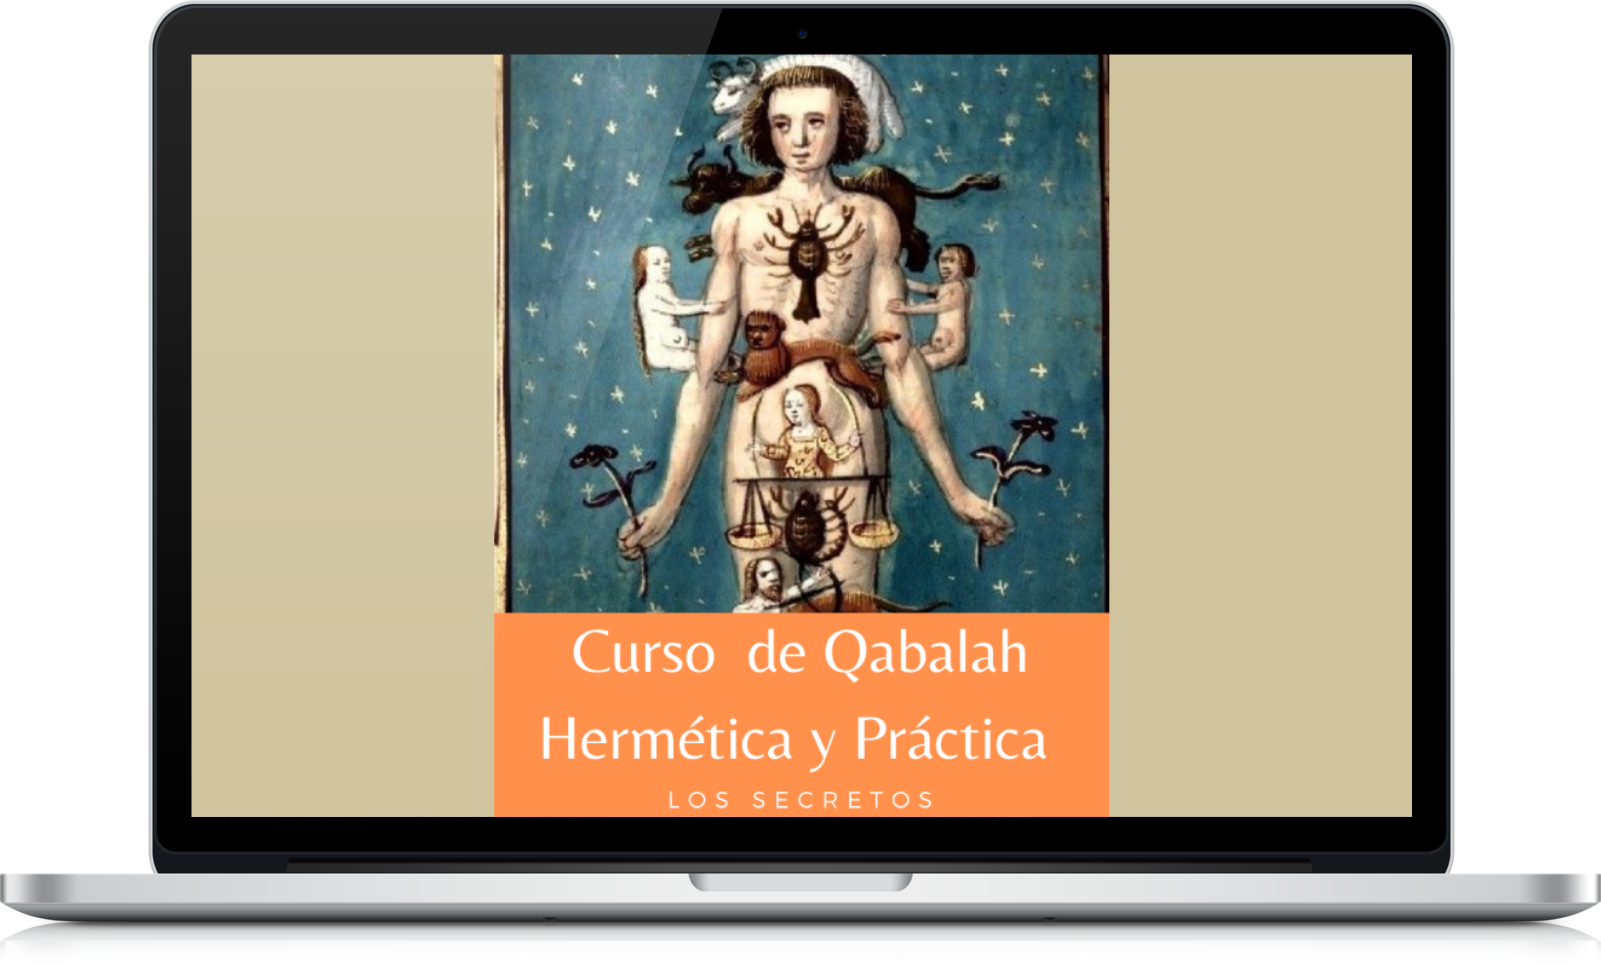 Curso de Qabalah Hermética y Práctica